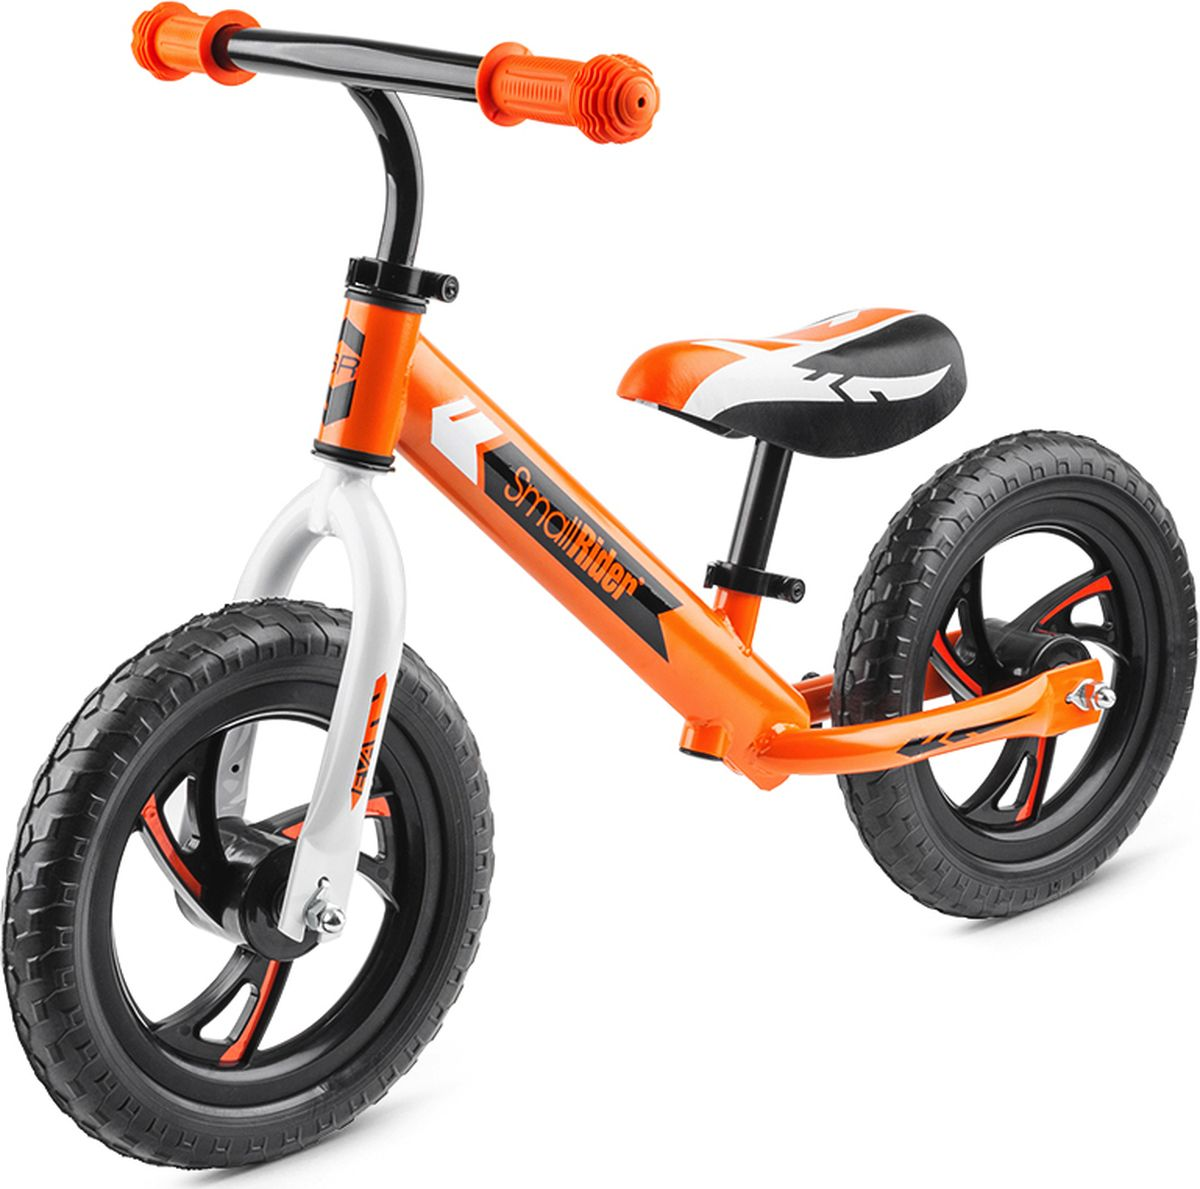 Small Rider Беговел детский Roadster цвет оранжевый -  Беговелы